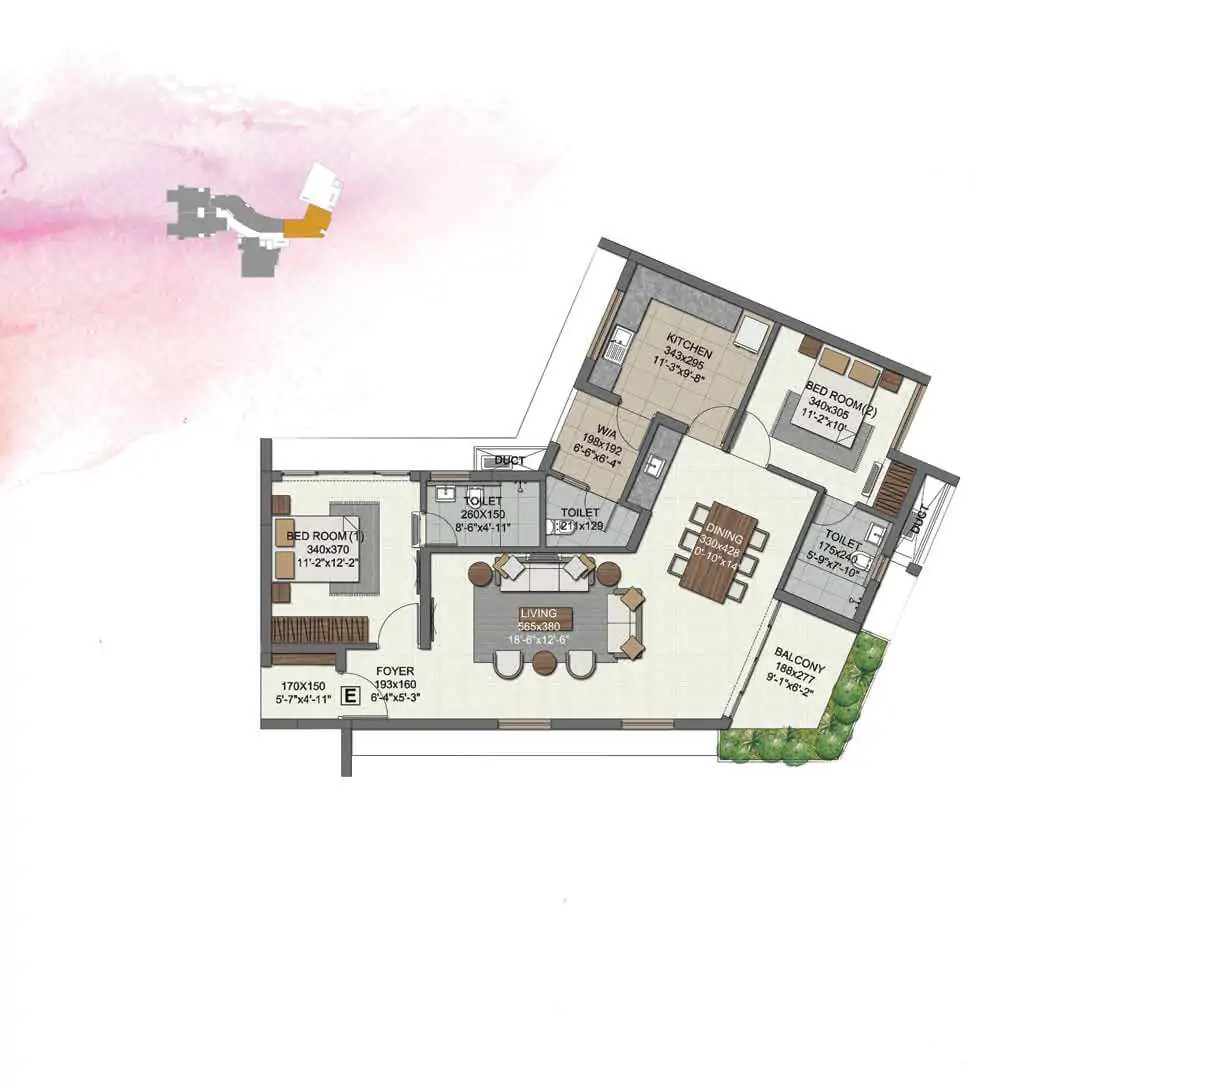 UNIT E (2 BHK) 3rd & 4th FLOORS